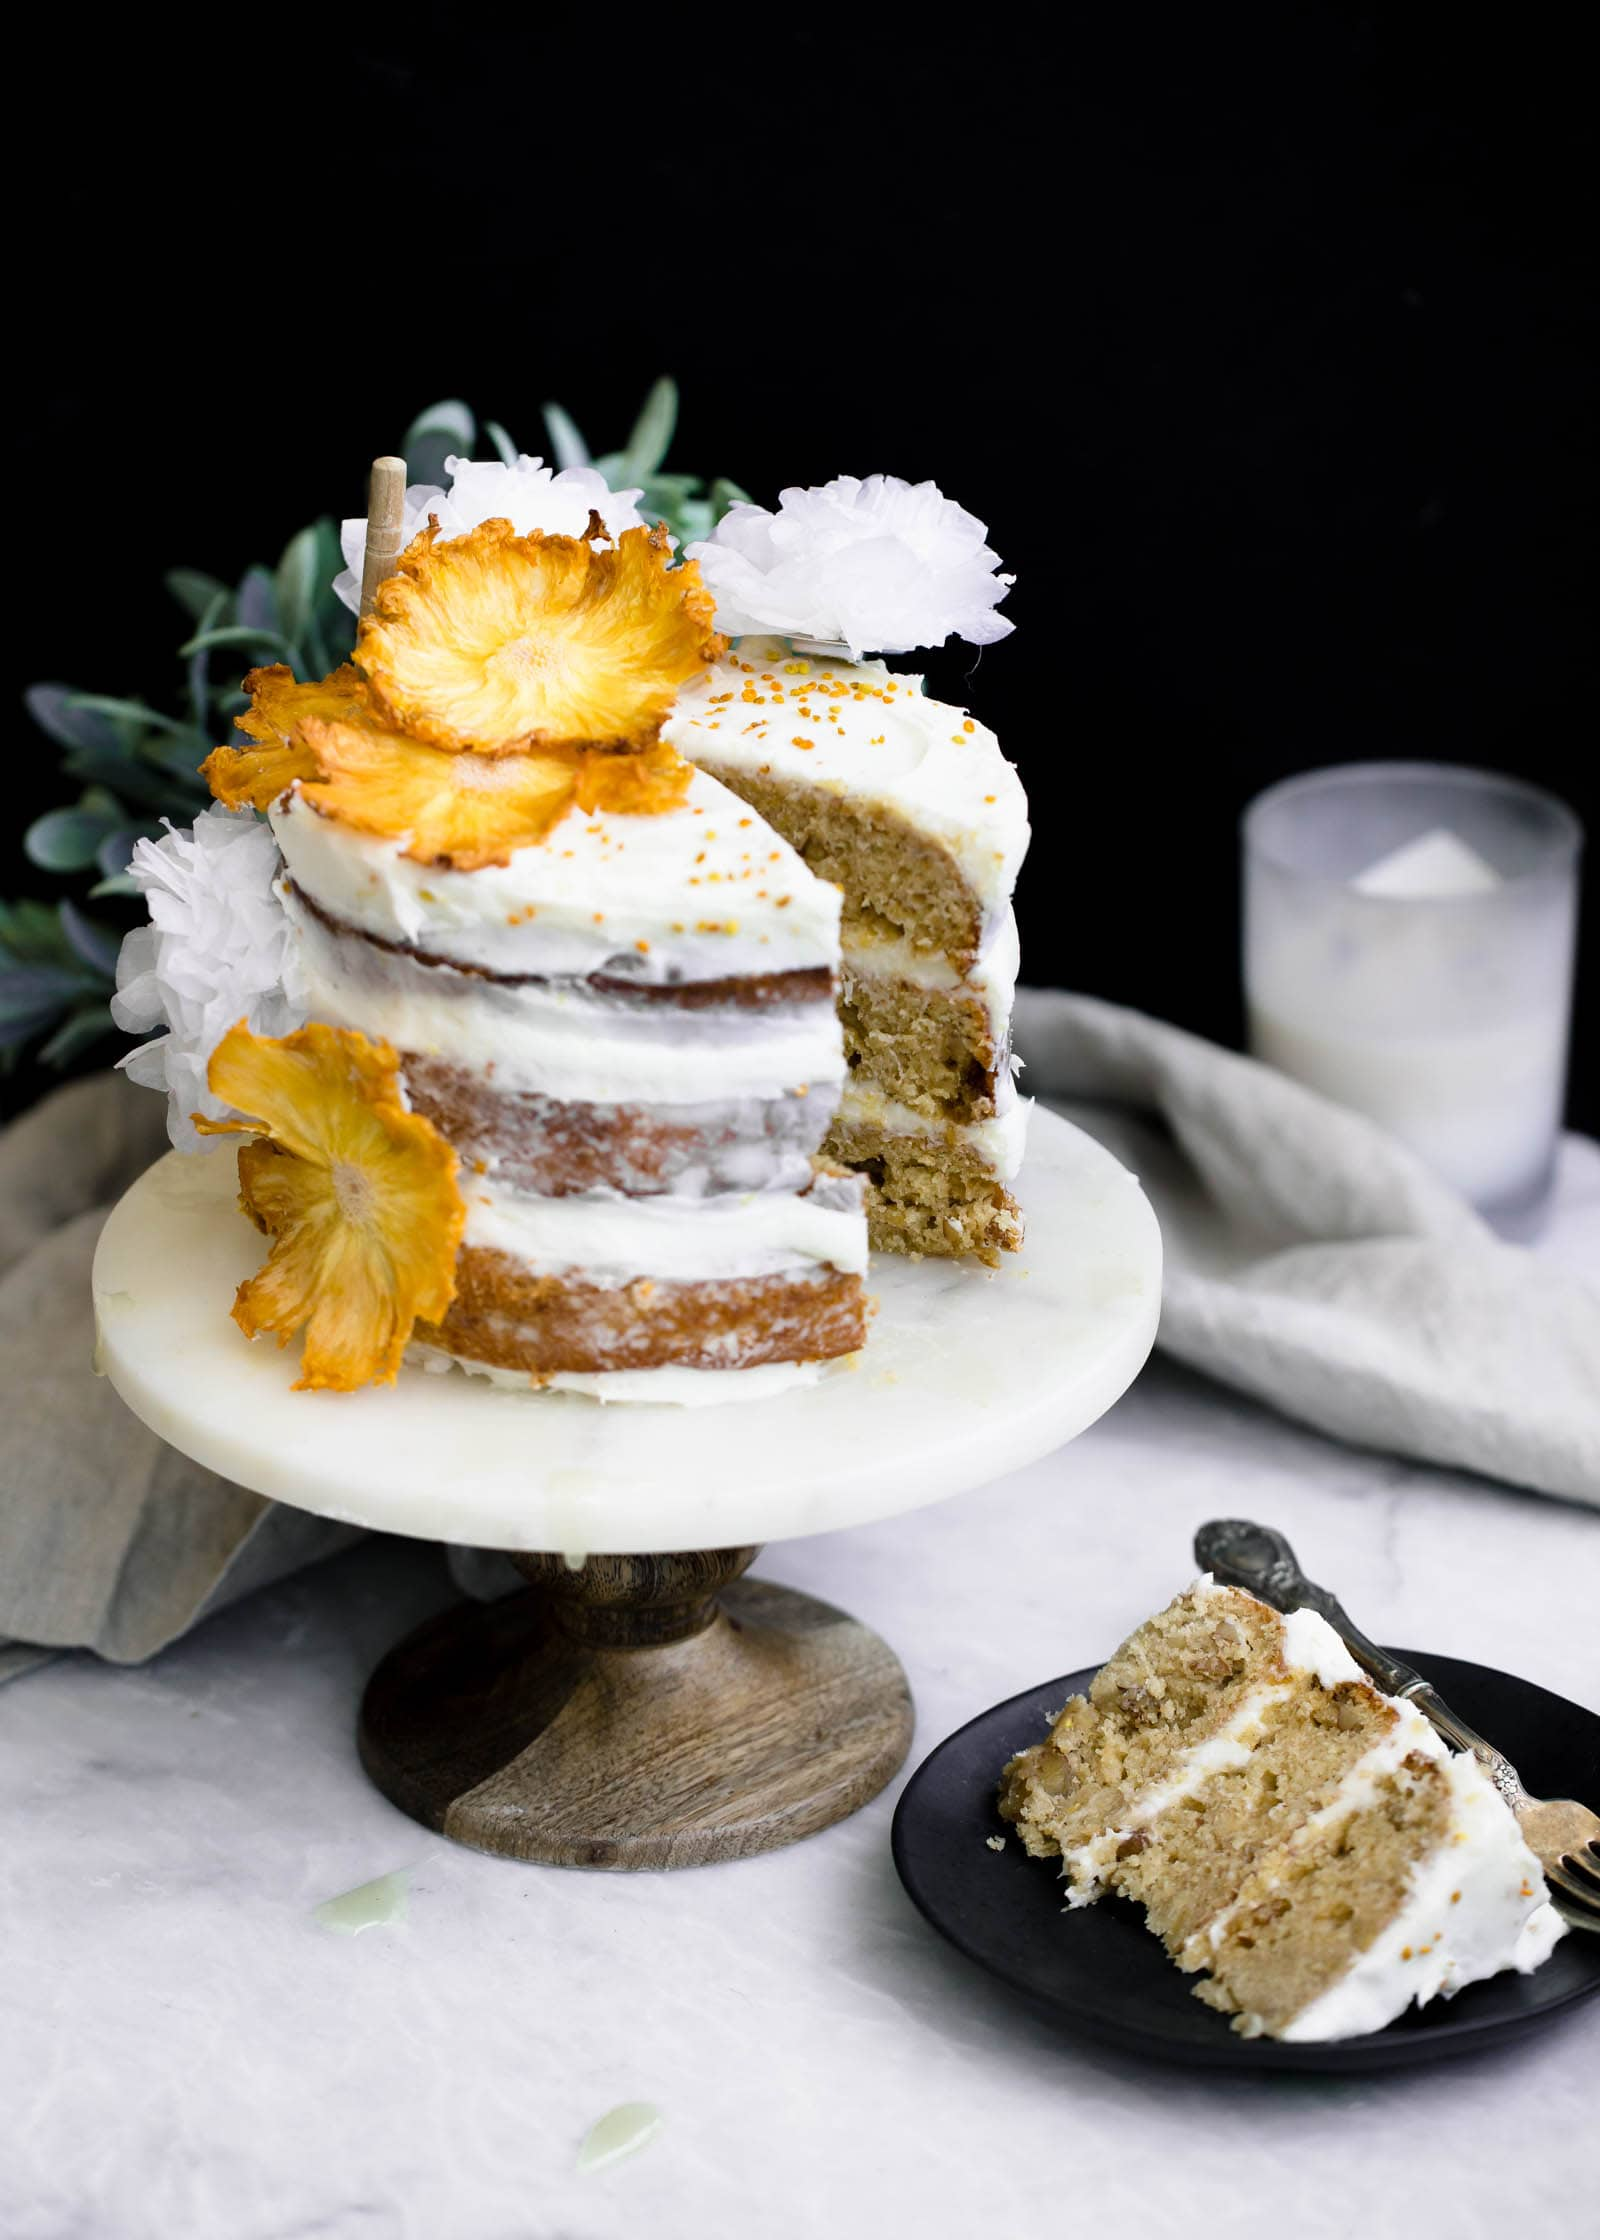 Hummingbird Cake slice on a plate next to cake stand